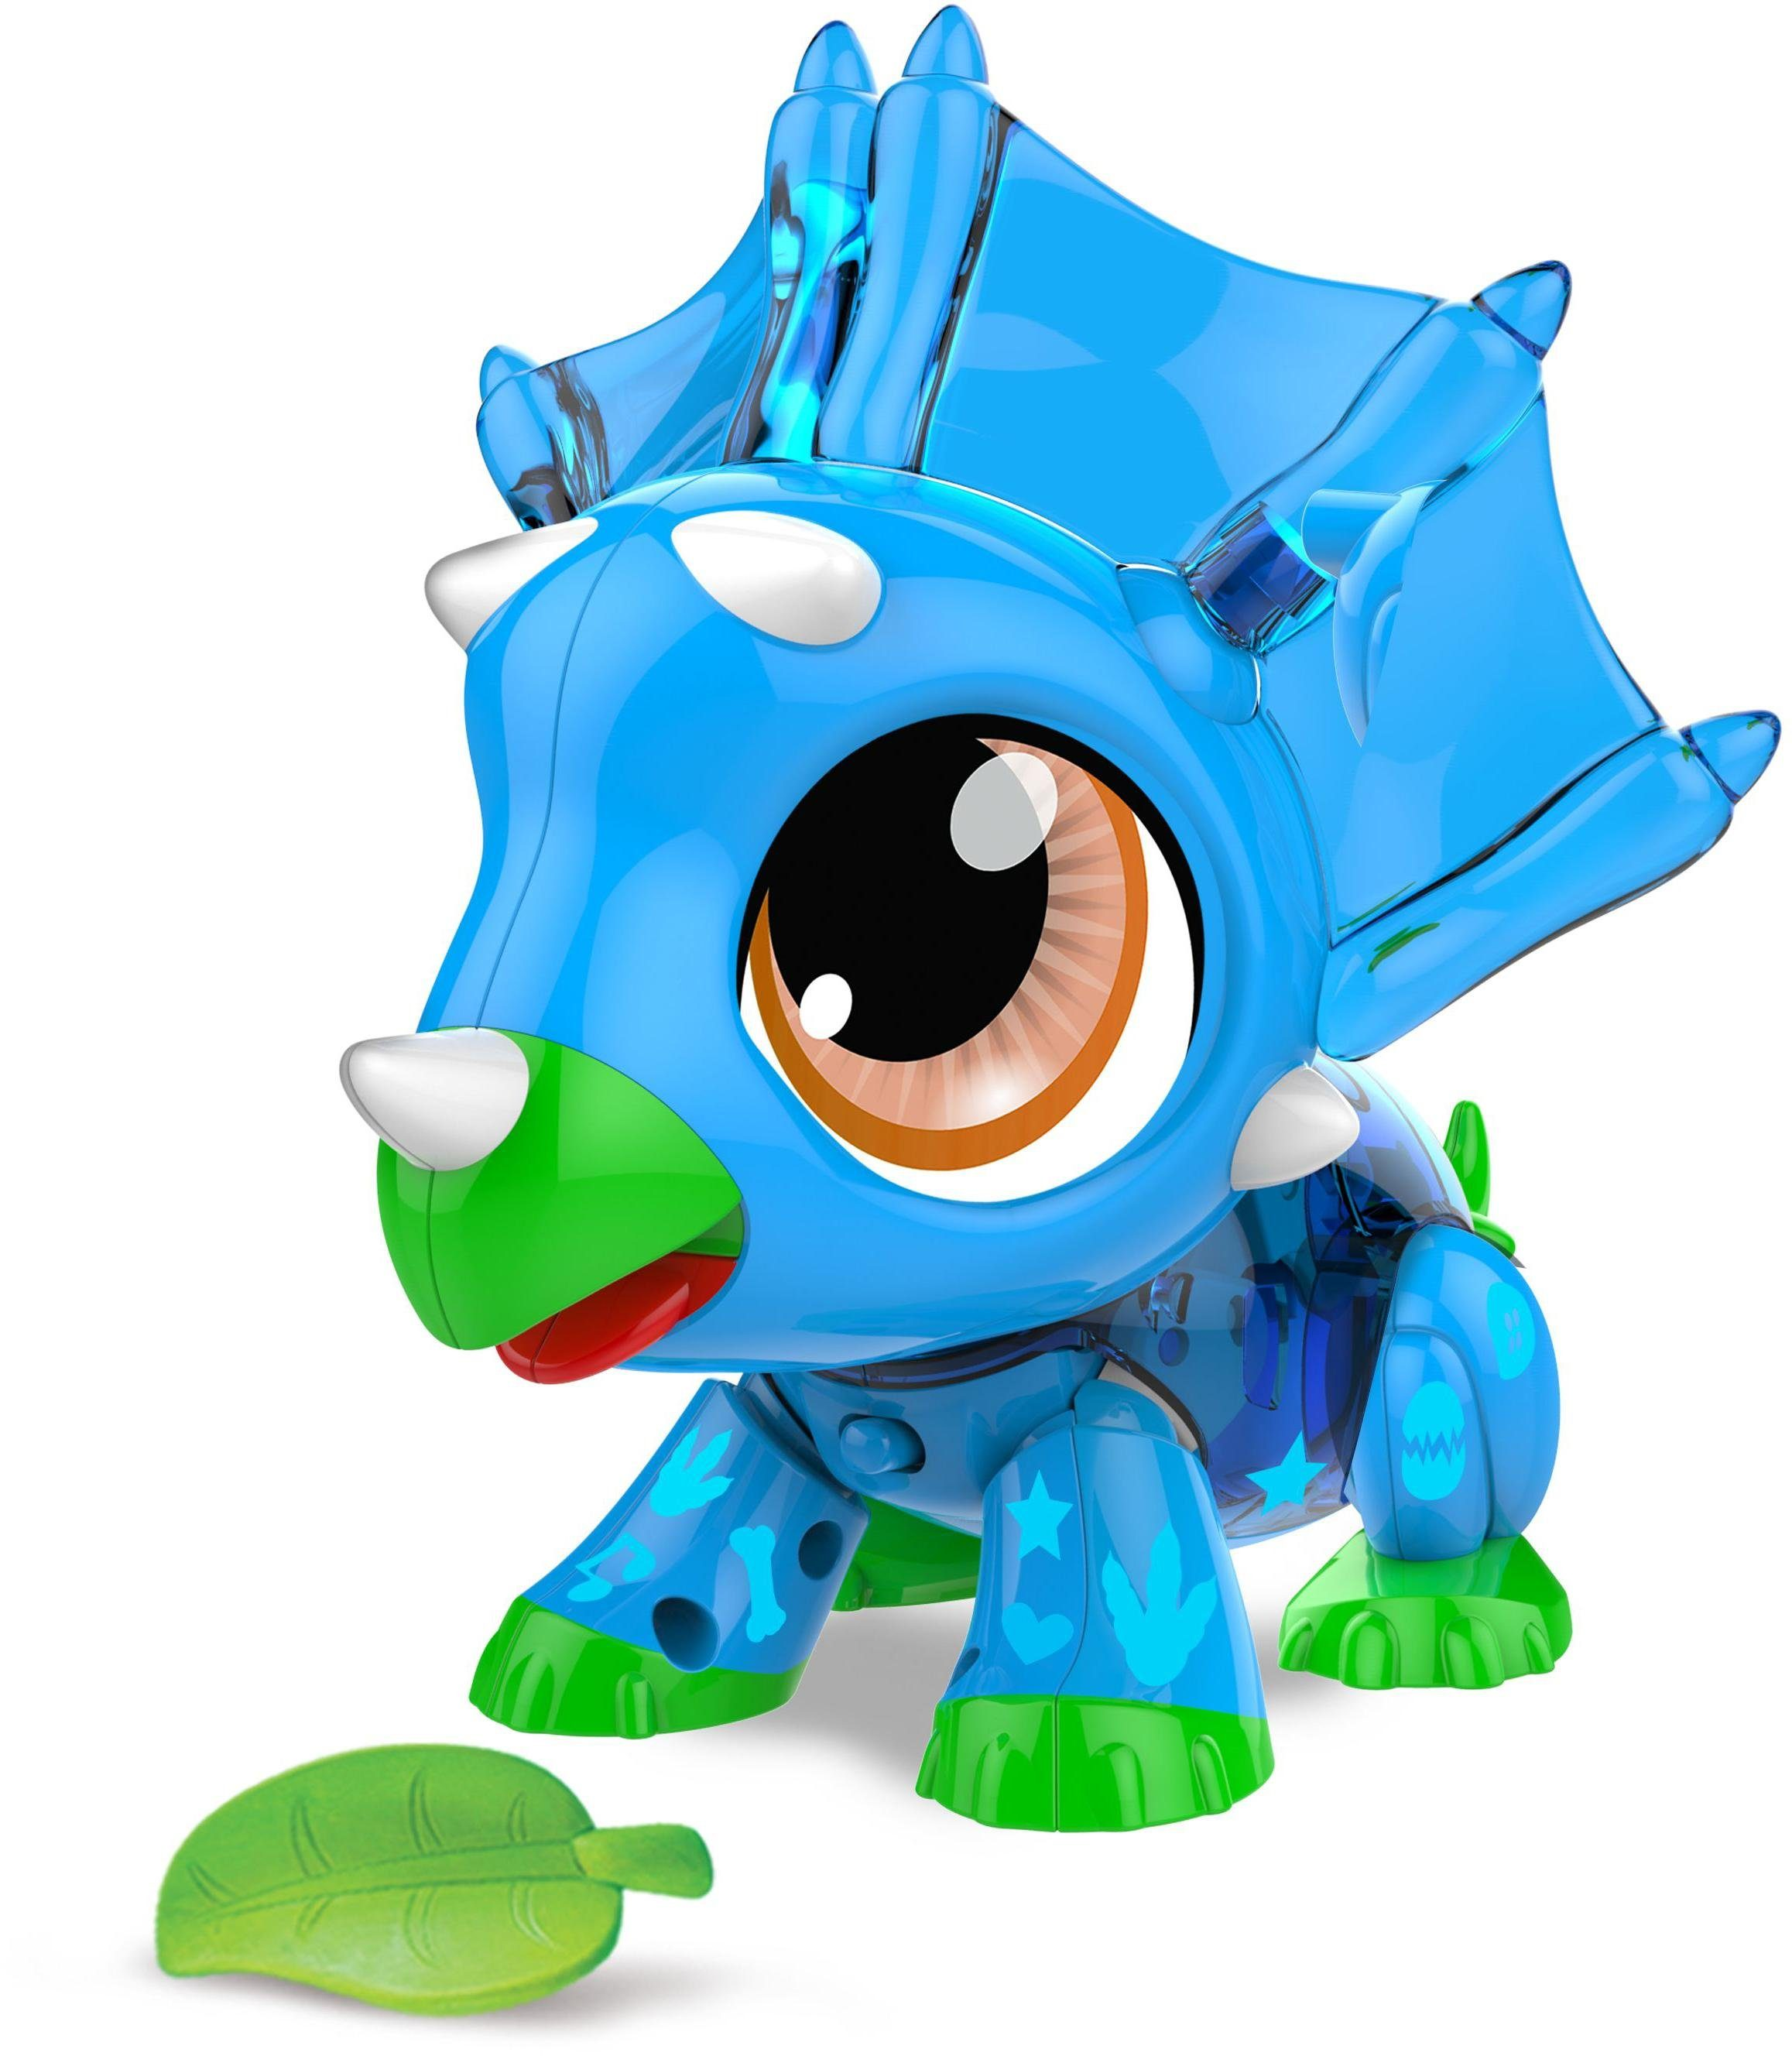 KD Kidz Delight Roboter Baukasten, »Build-A-Bot Dino«